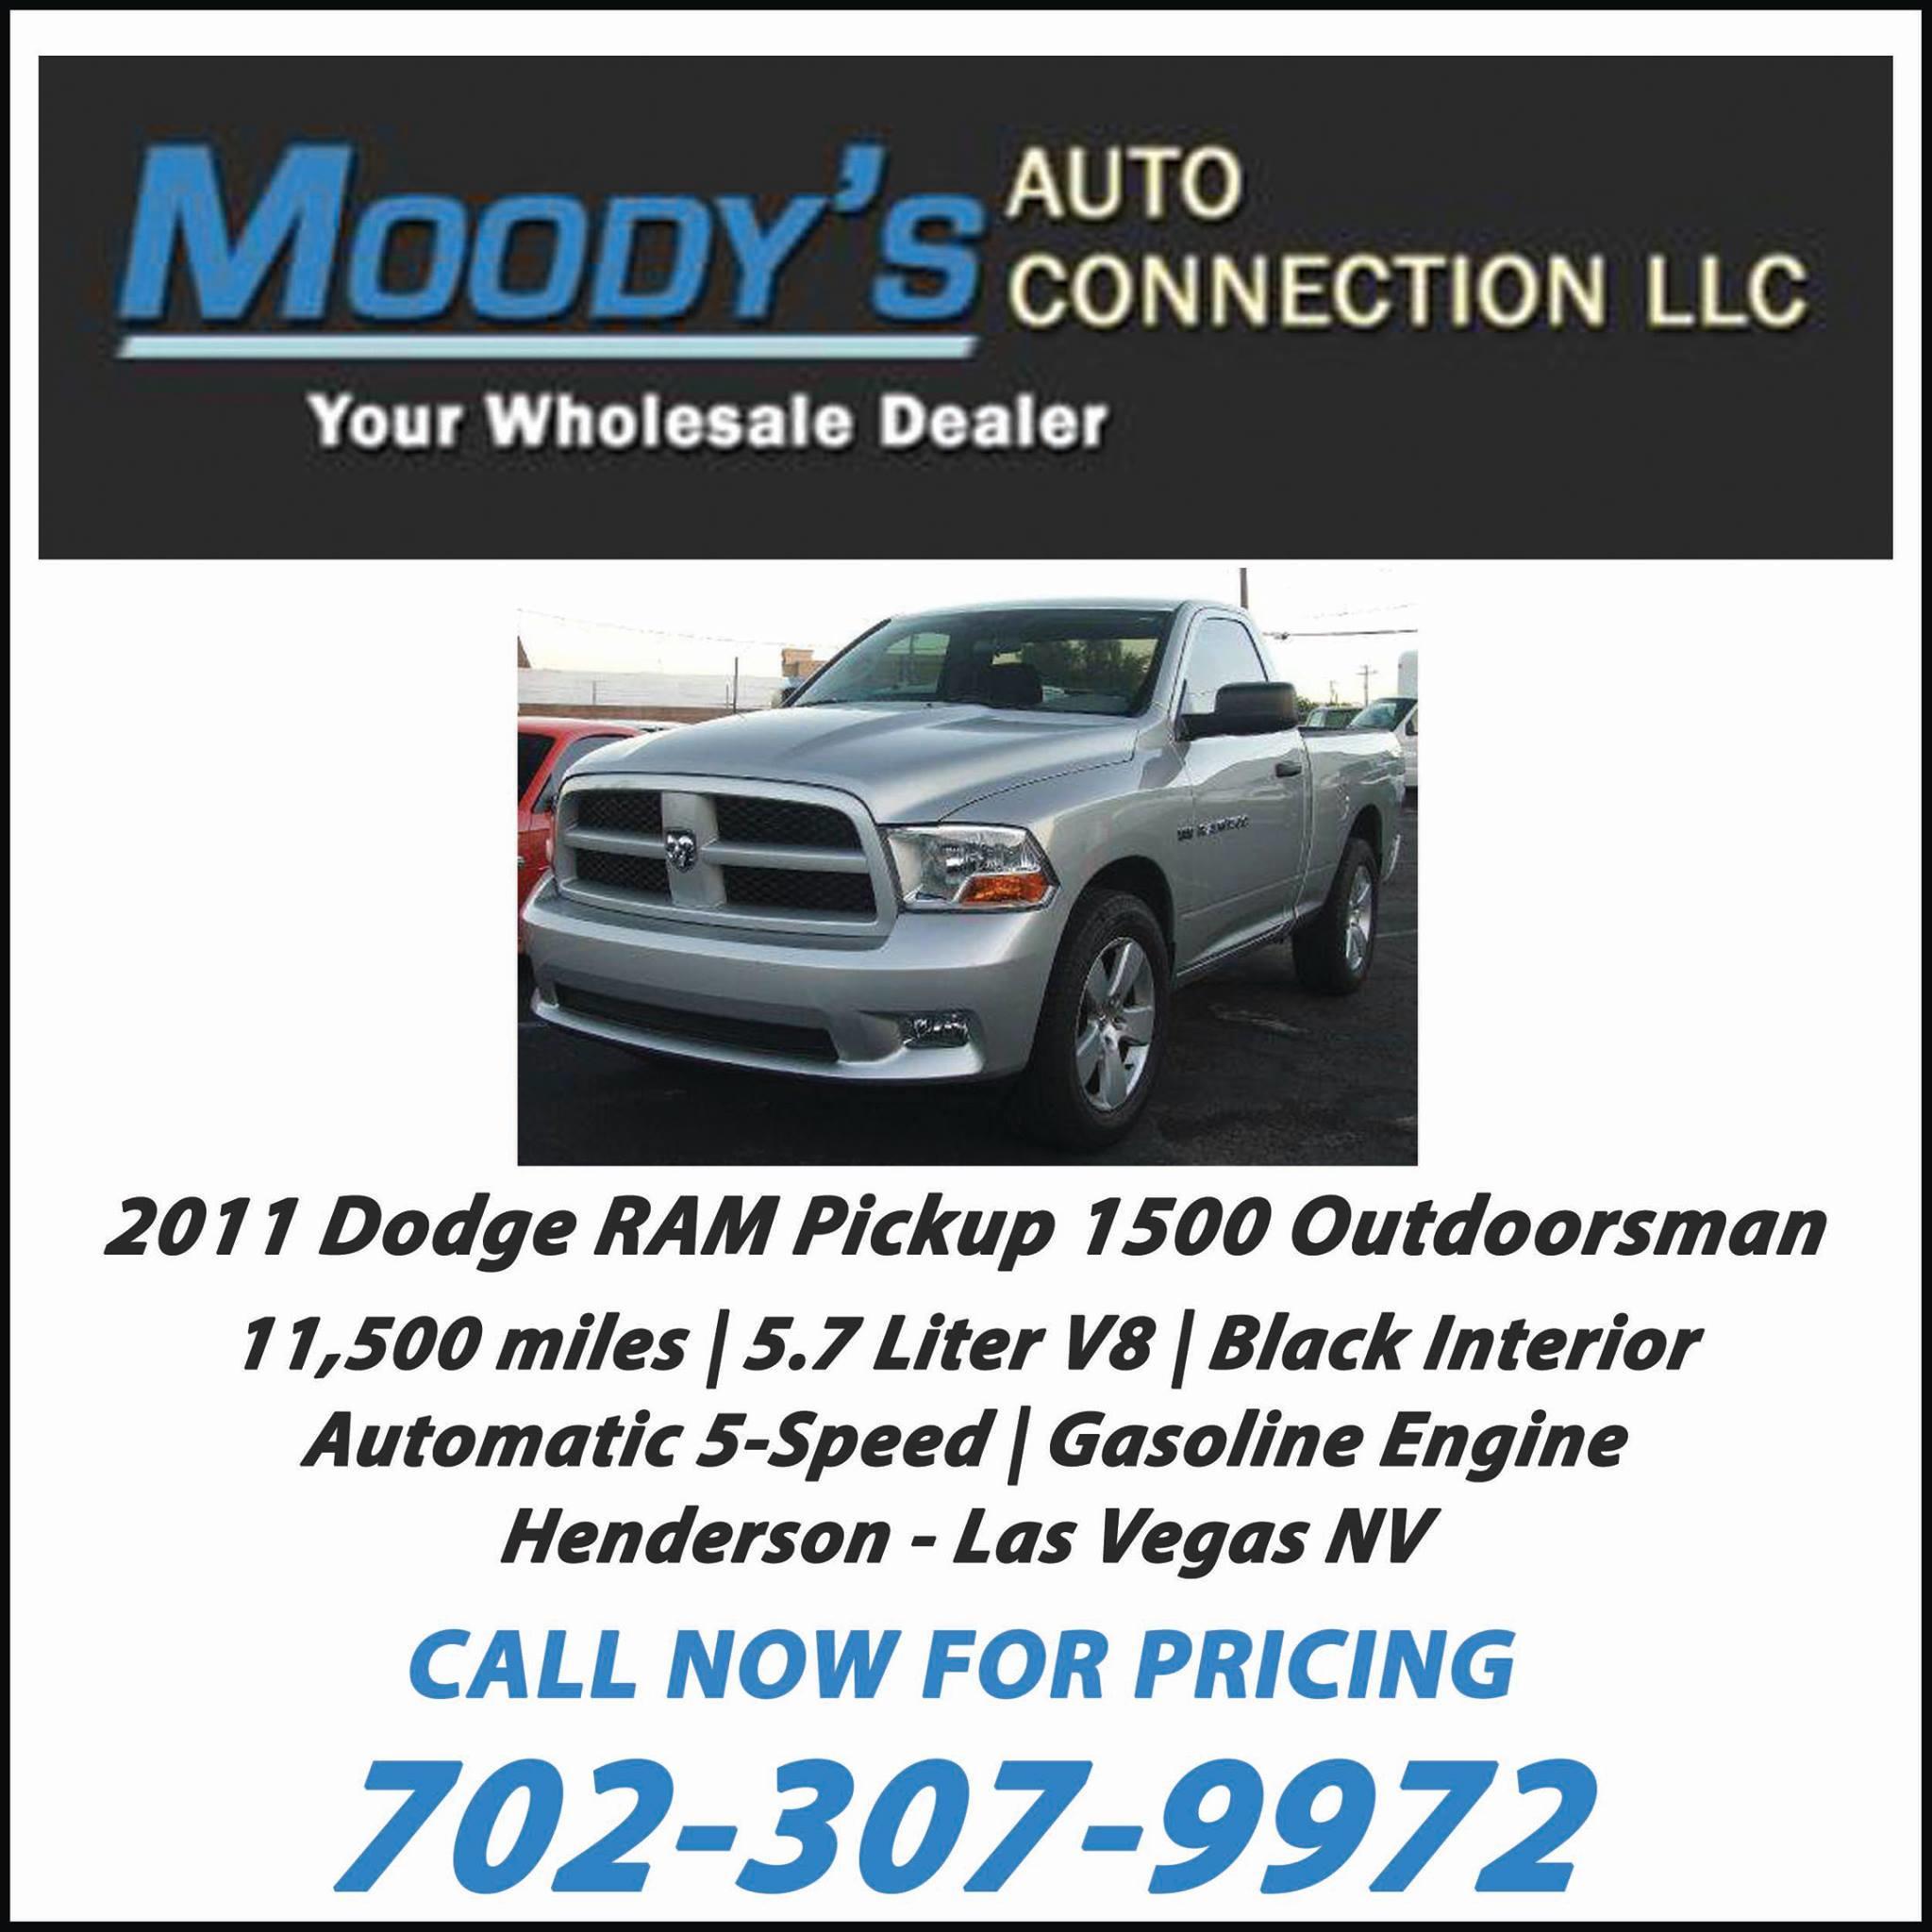 Moody S Auto Connection Llc Henderson Nevada Nv